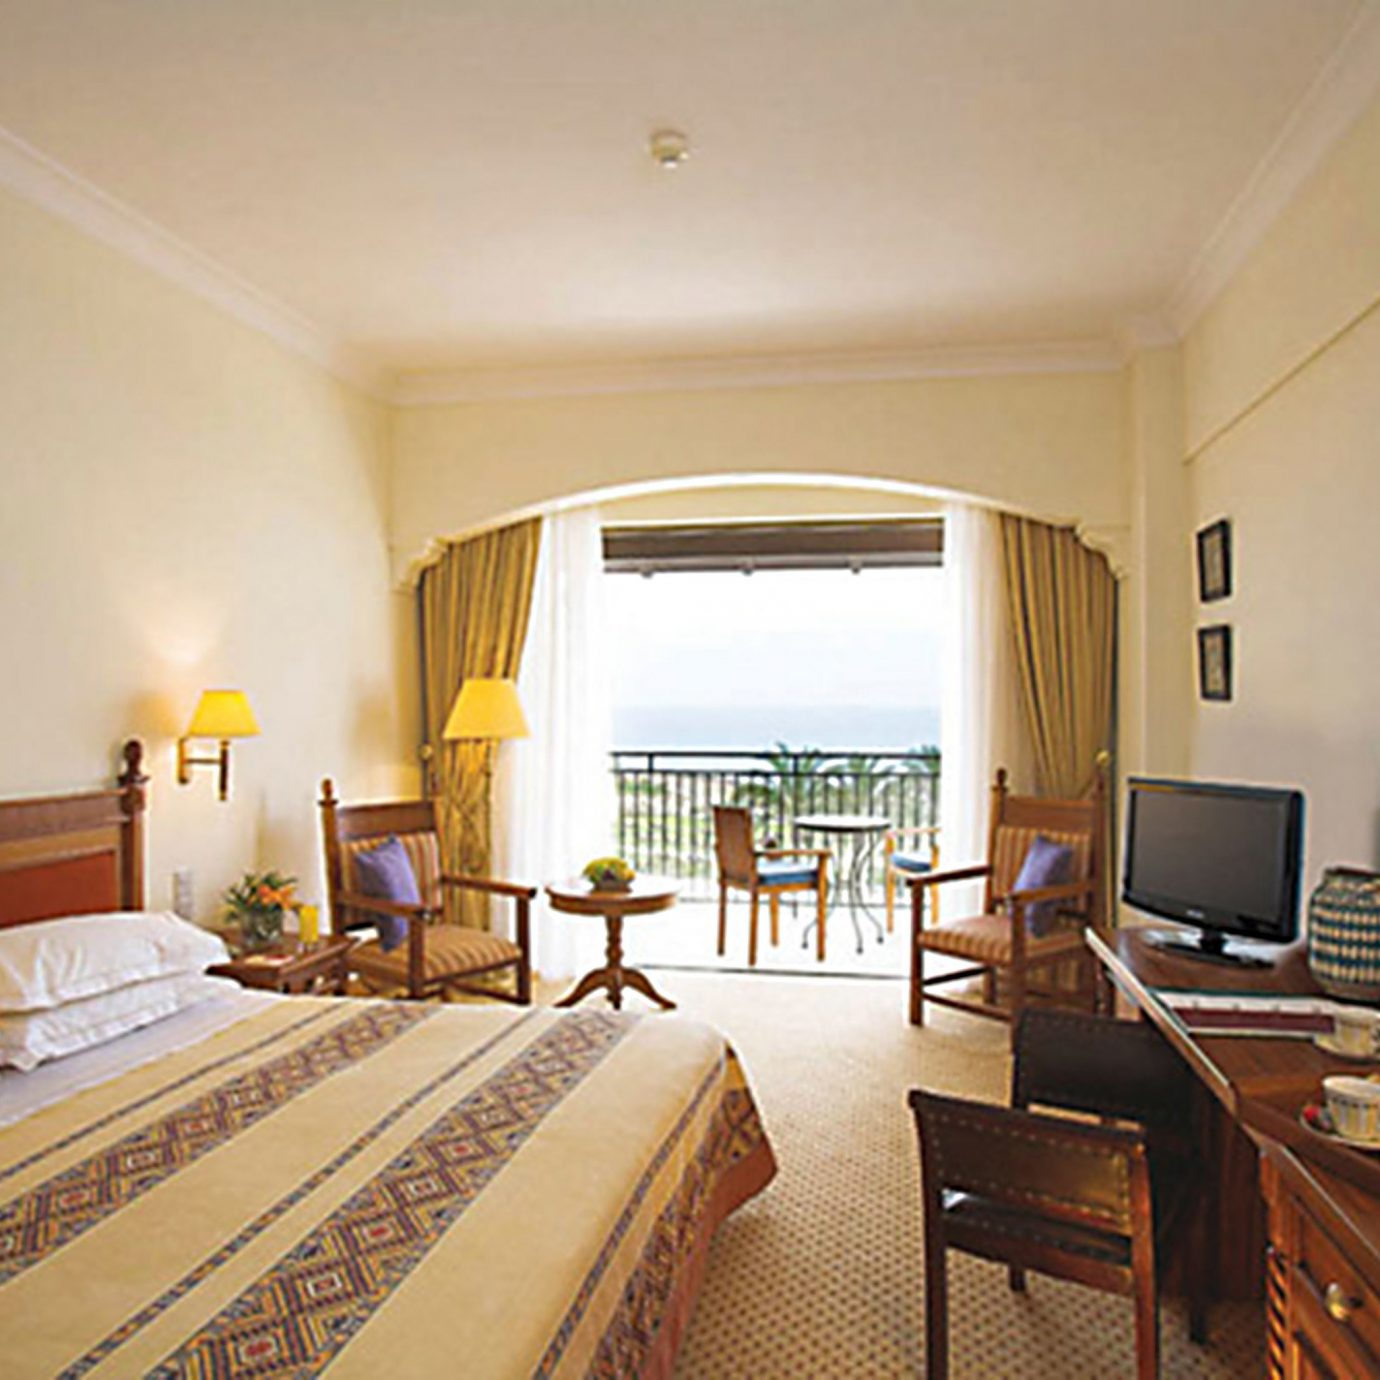 Balcony Bedroom Scenic views Suite property home hardwood cottage Villa condominium living room